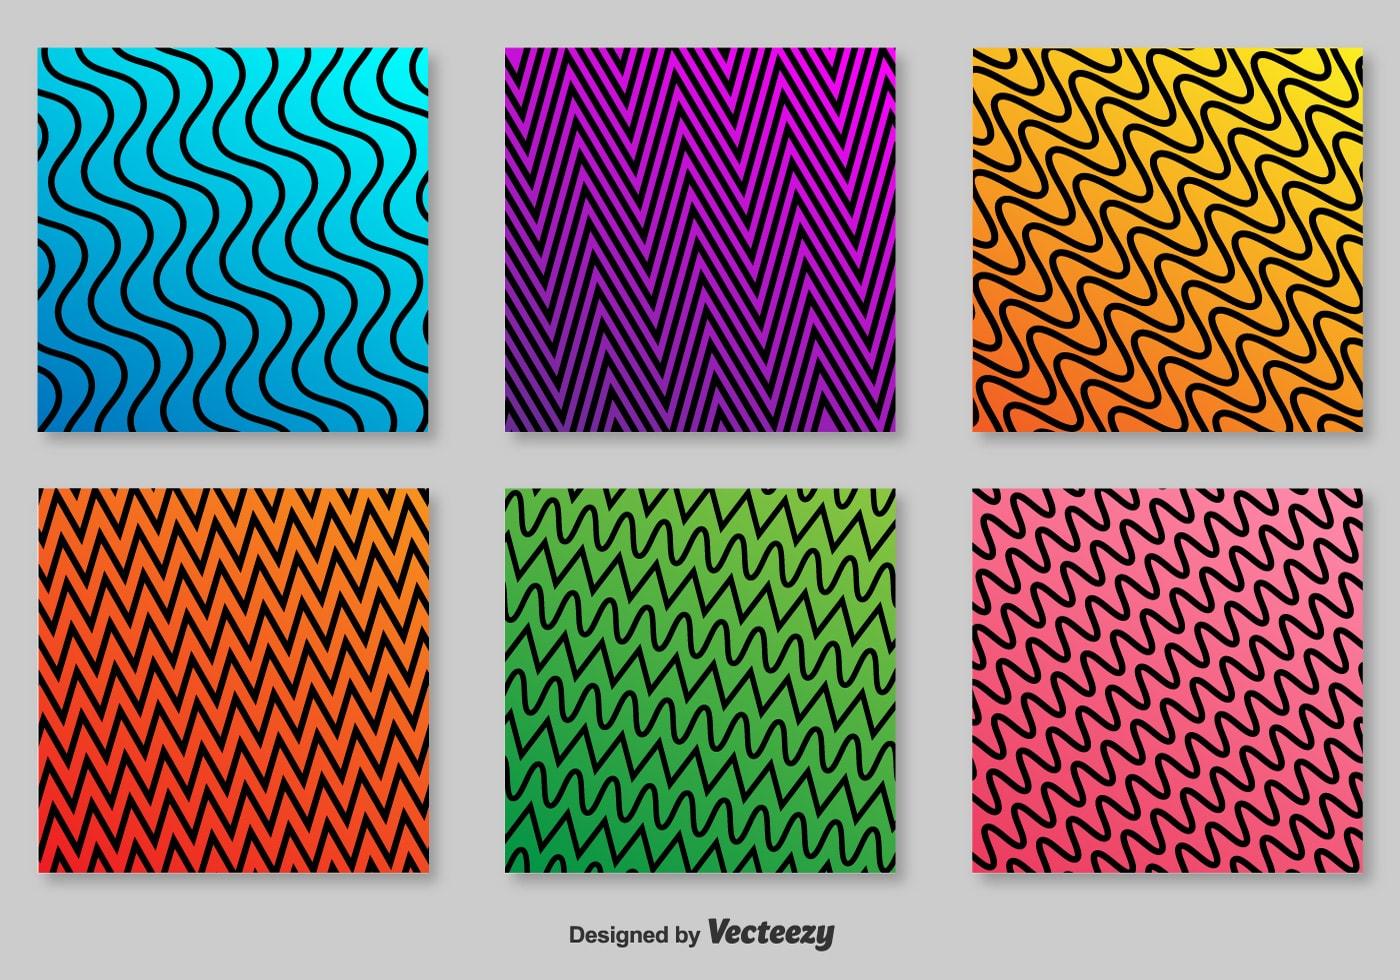 Retro Zigzag Vector Patterns